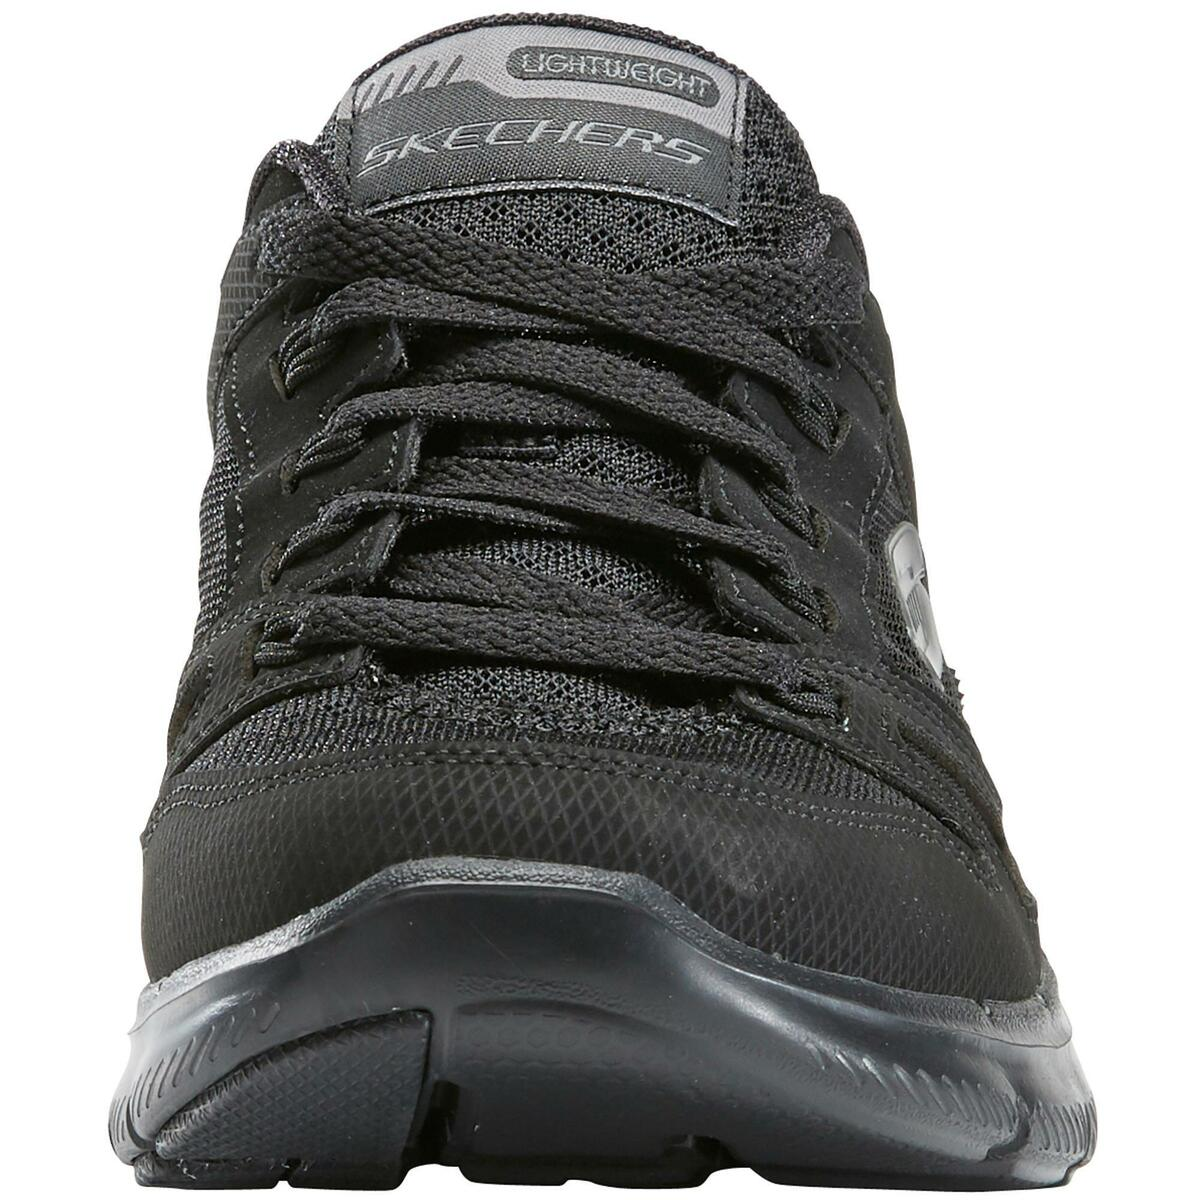 Bild 3 von Walkingschuhe Flex Dual Lite Damen schwarz